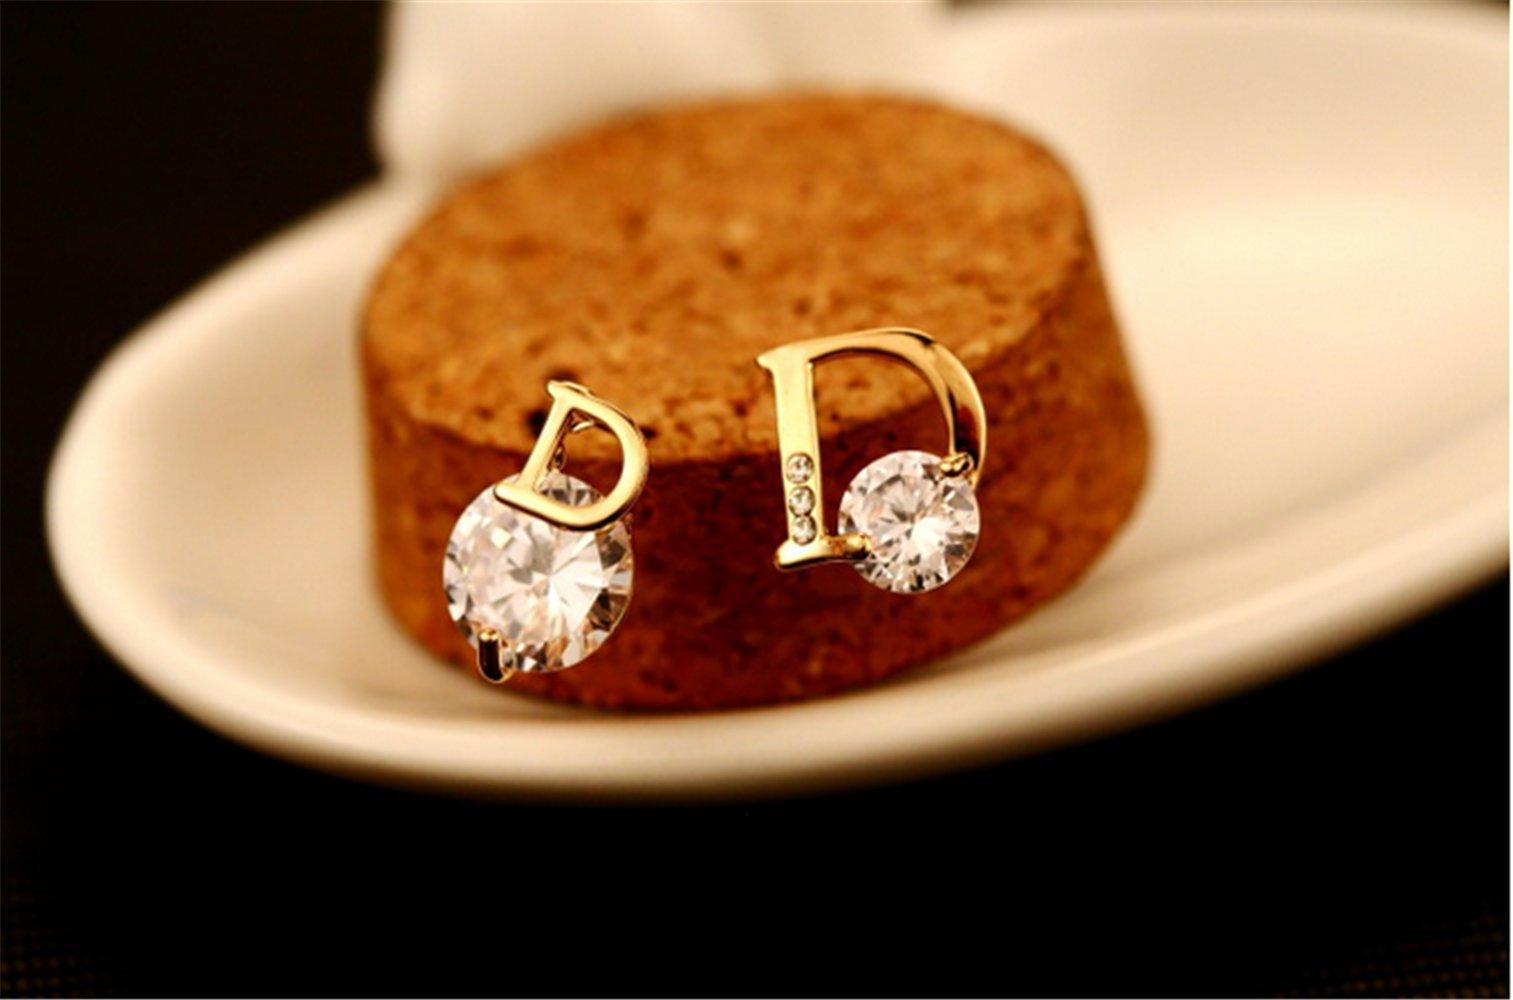 P.phoebus 18K Yellow Gold Plated Vintage White Swarovski Crystal Studs Earrings Rhinestones Dangle Charms Hoops For Women Girls (3)